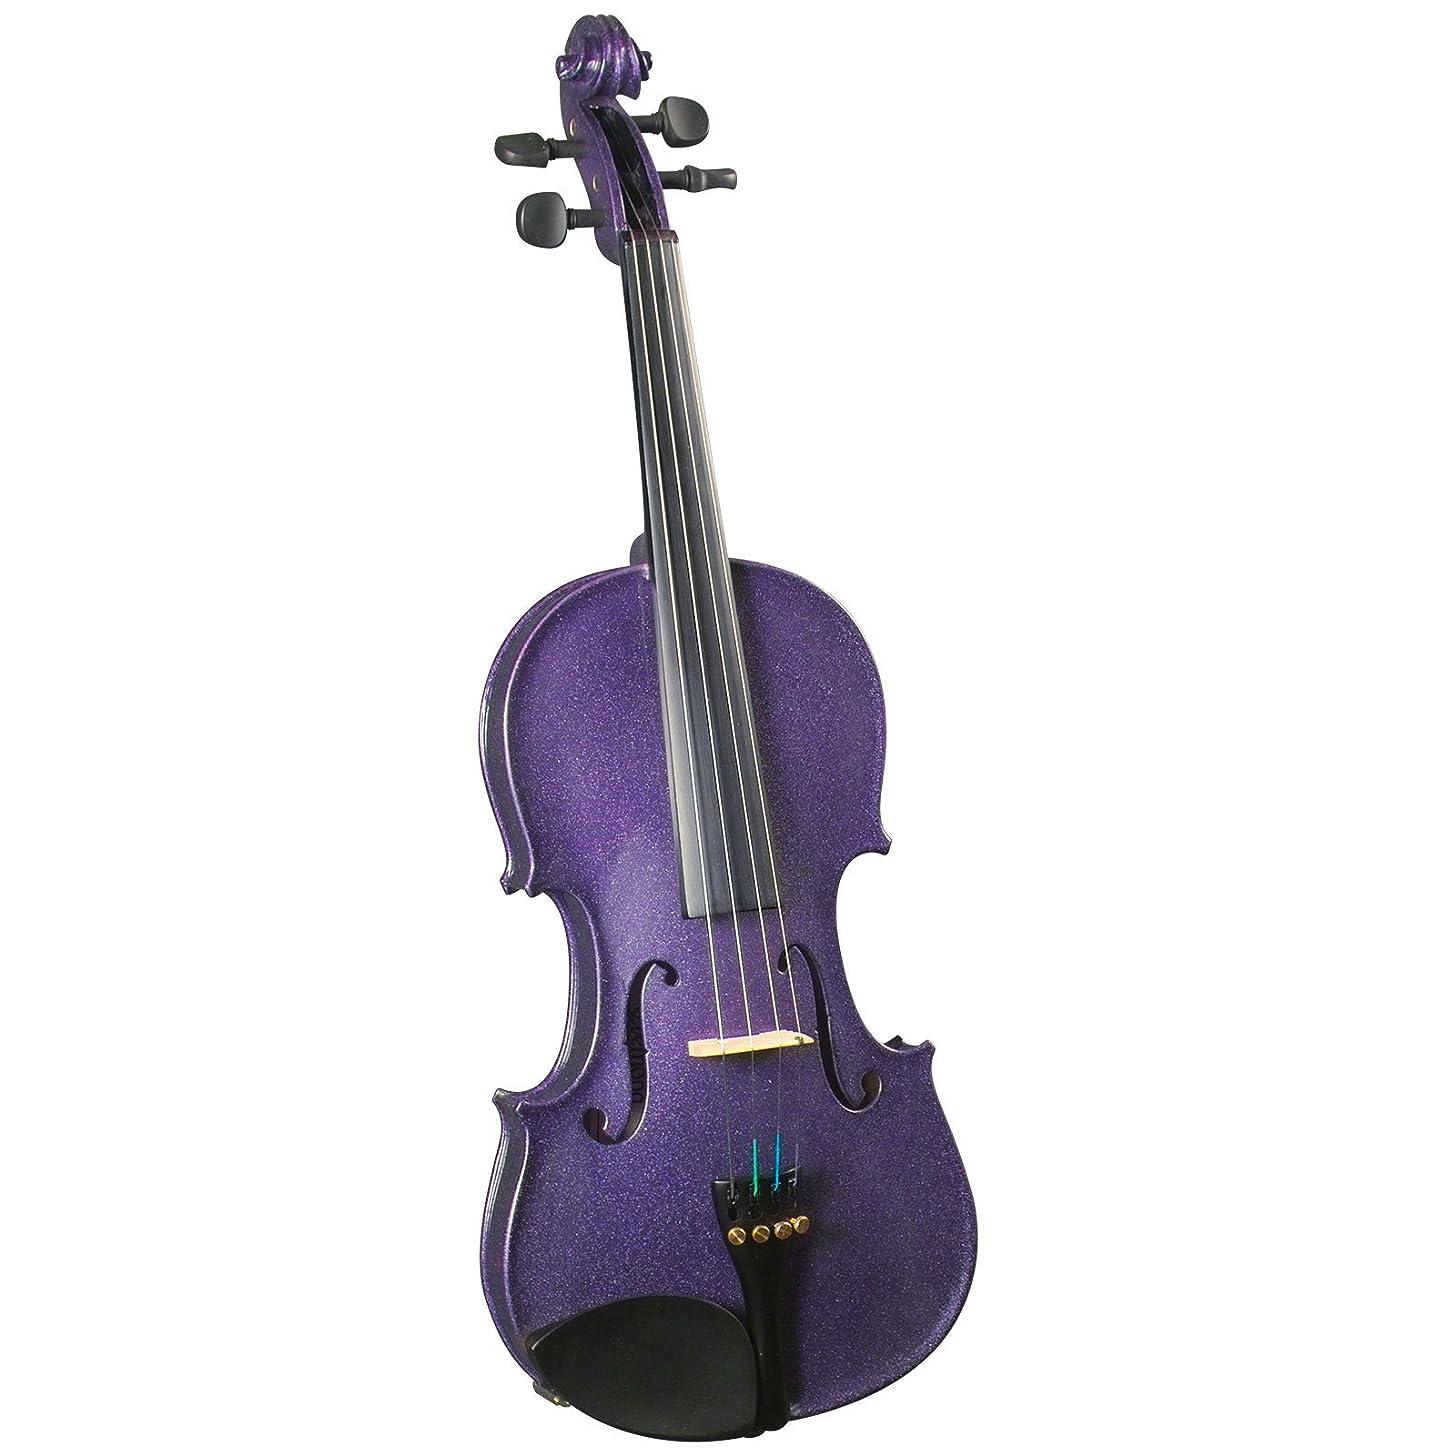 Cremona SV-130 Premier Novice Violin Outfit - Sparkling Purple - 4/4 Size